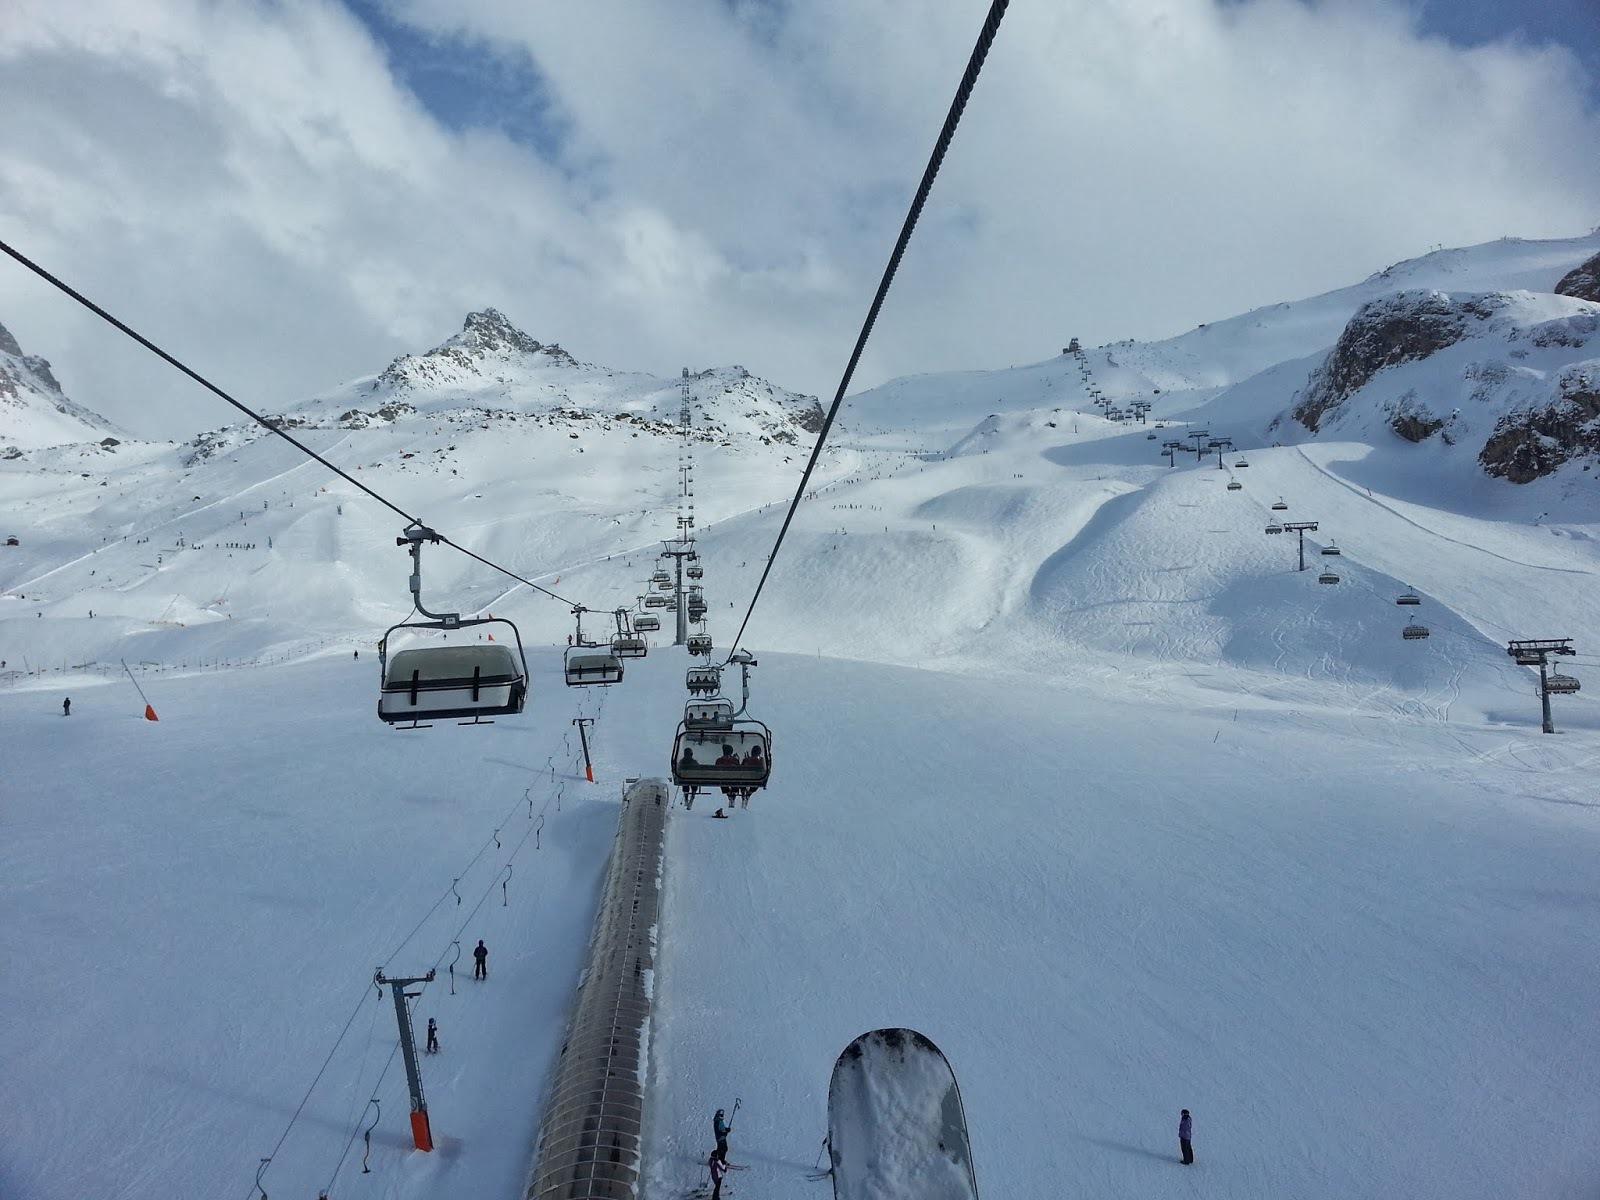 ski lift skiing snowboarding - photo #49